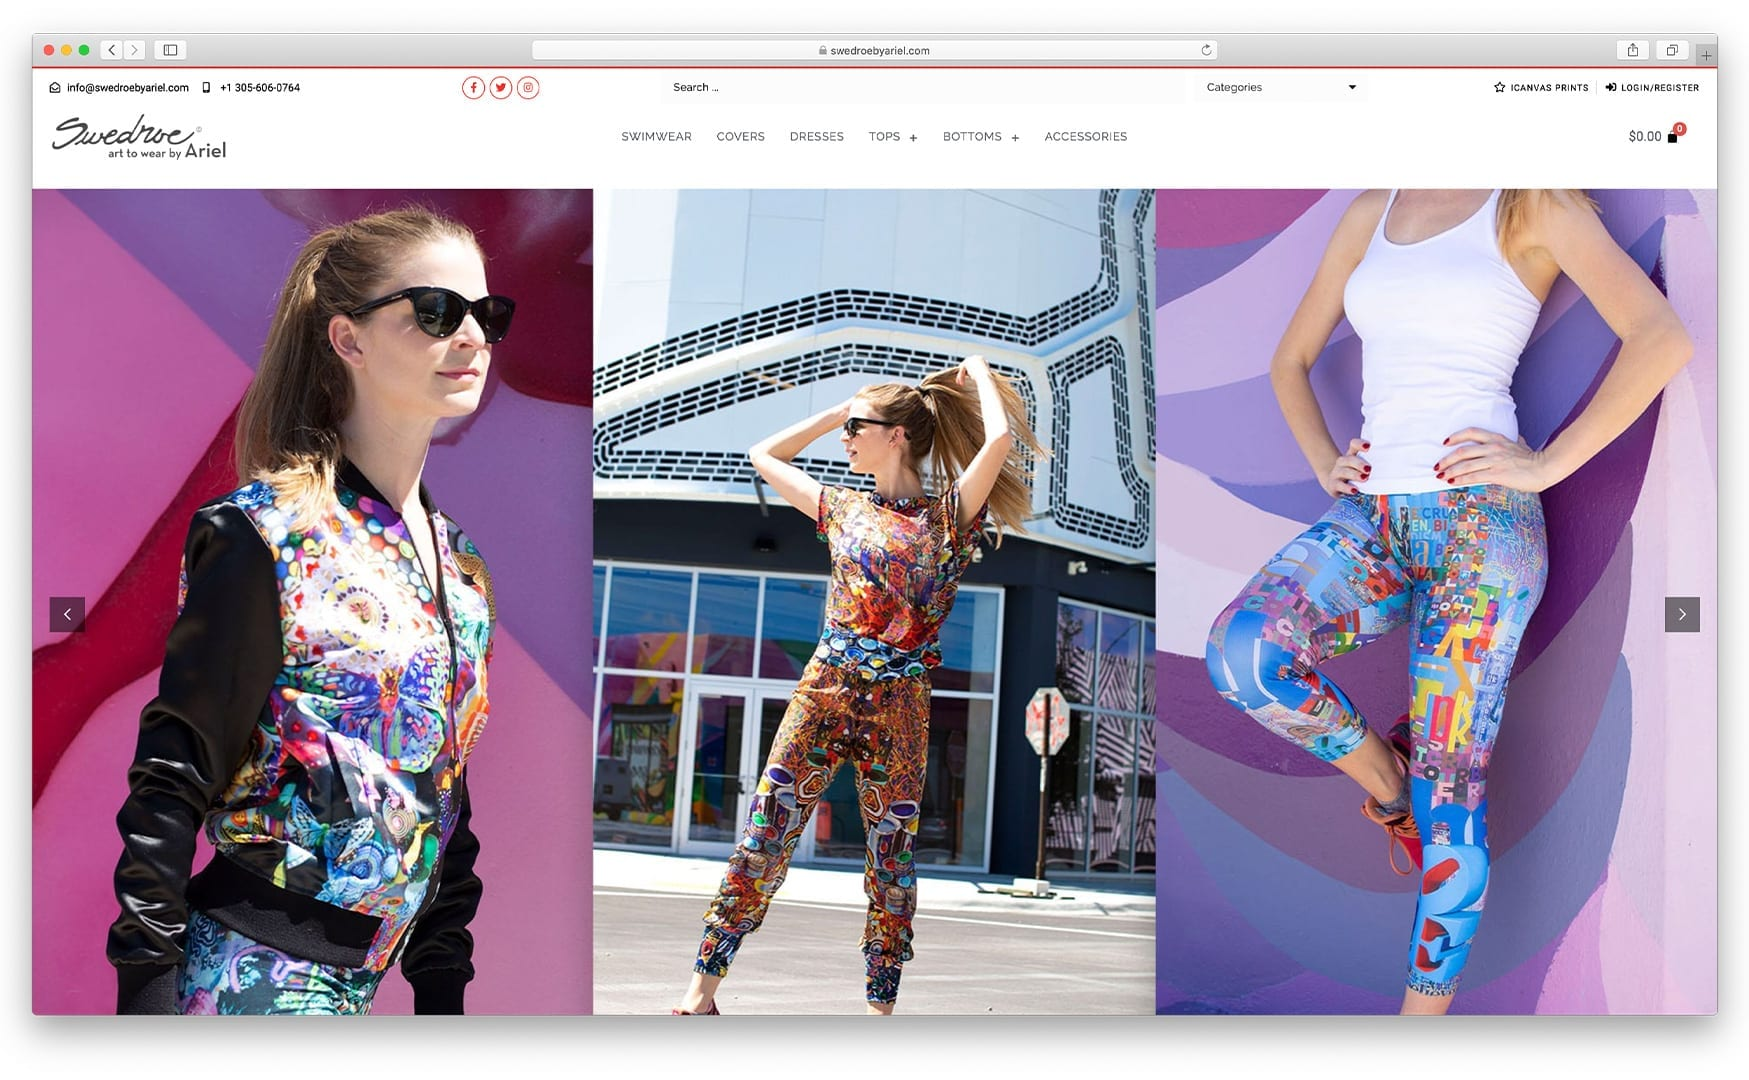 Swedroe by Ariel - Online Store built with bizProWeb - Website Design by sliStudios   Miami